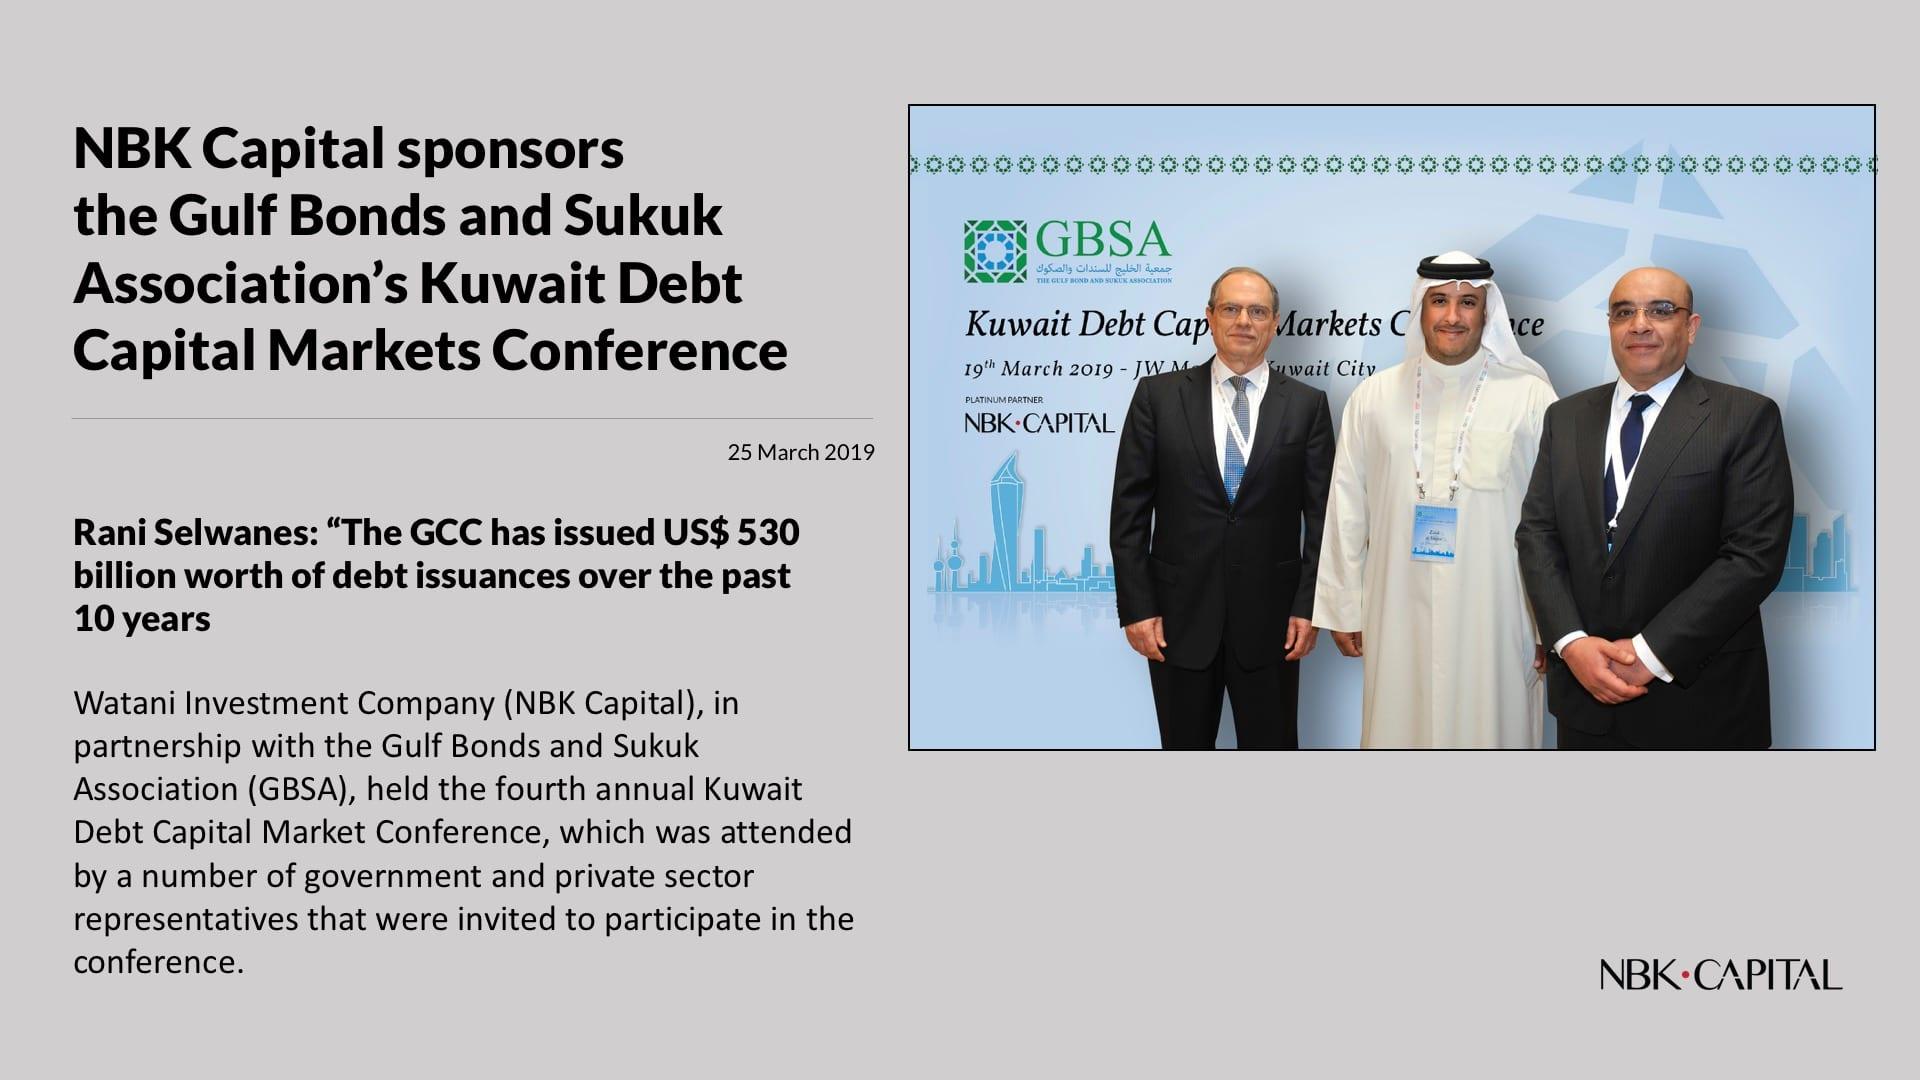 NBK Capital sponsors the Gulf Bonds and Sukuk Association's Kuwait Debt Capital Markets Conference